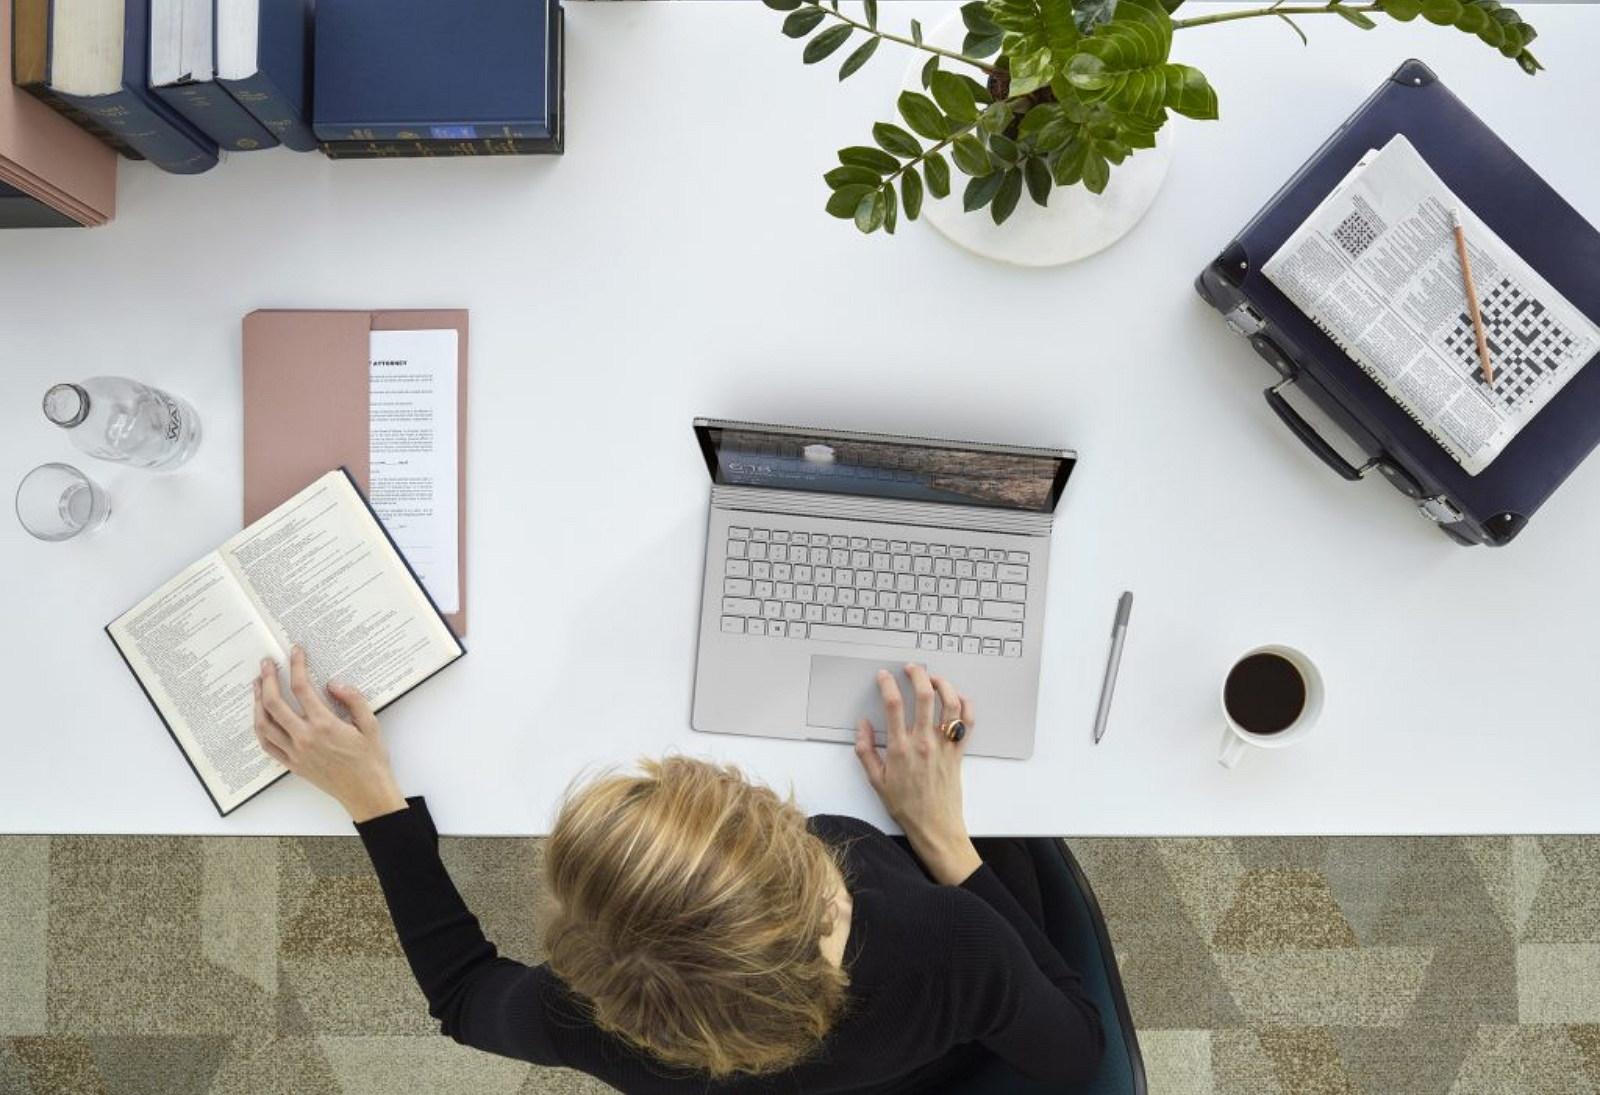 Microsoft Surface Plus program